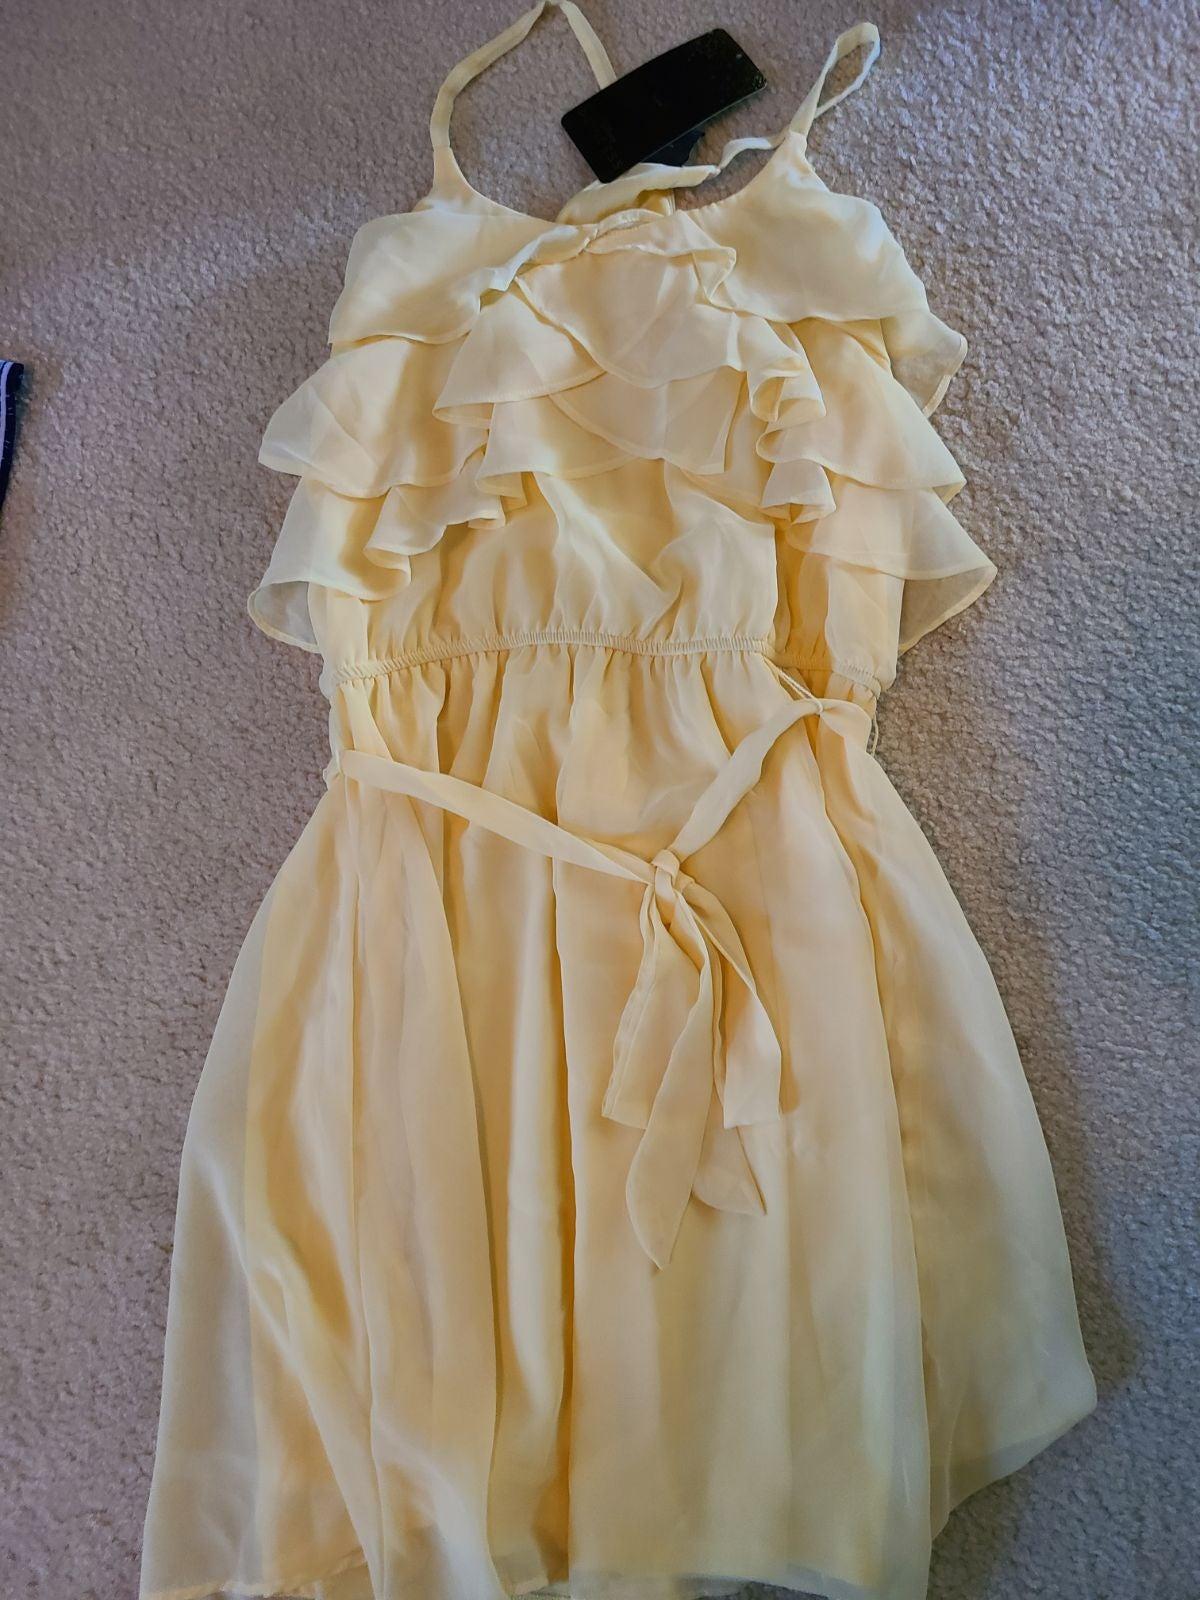 Disney Princess Belle Yellow Dress